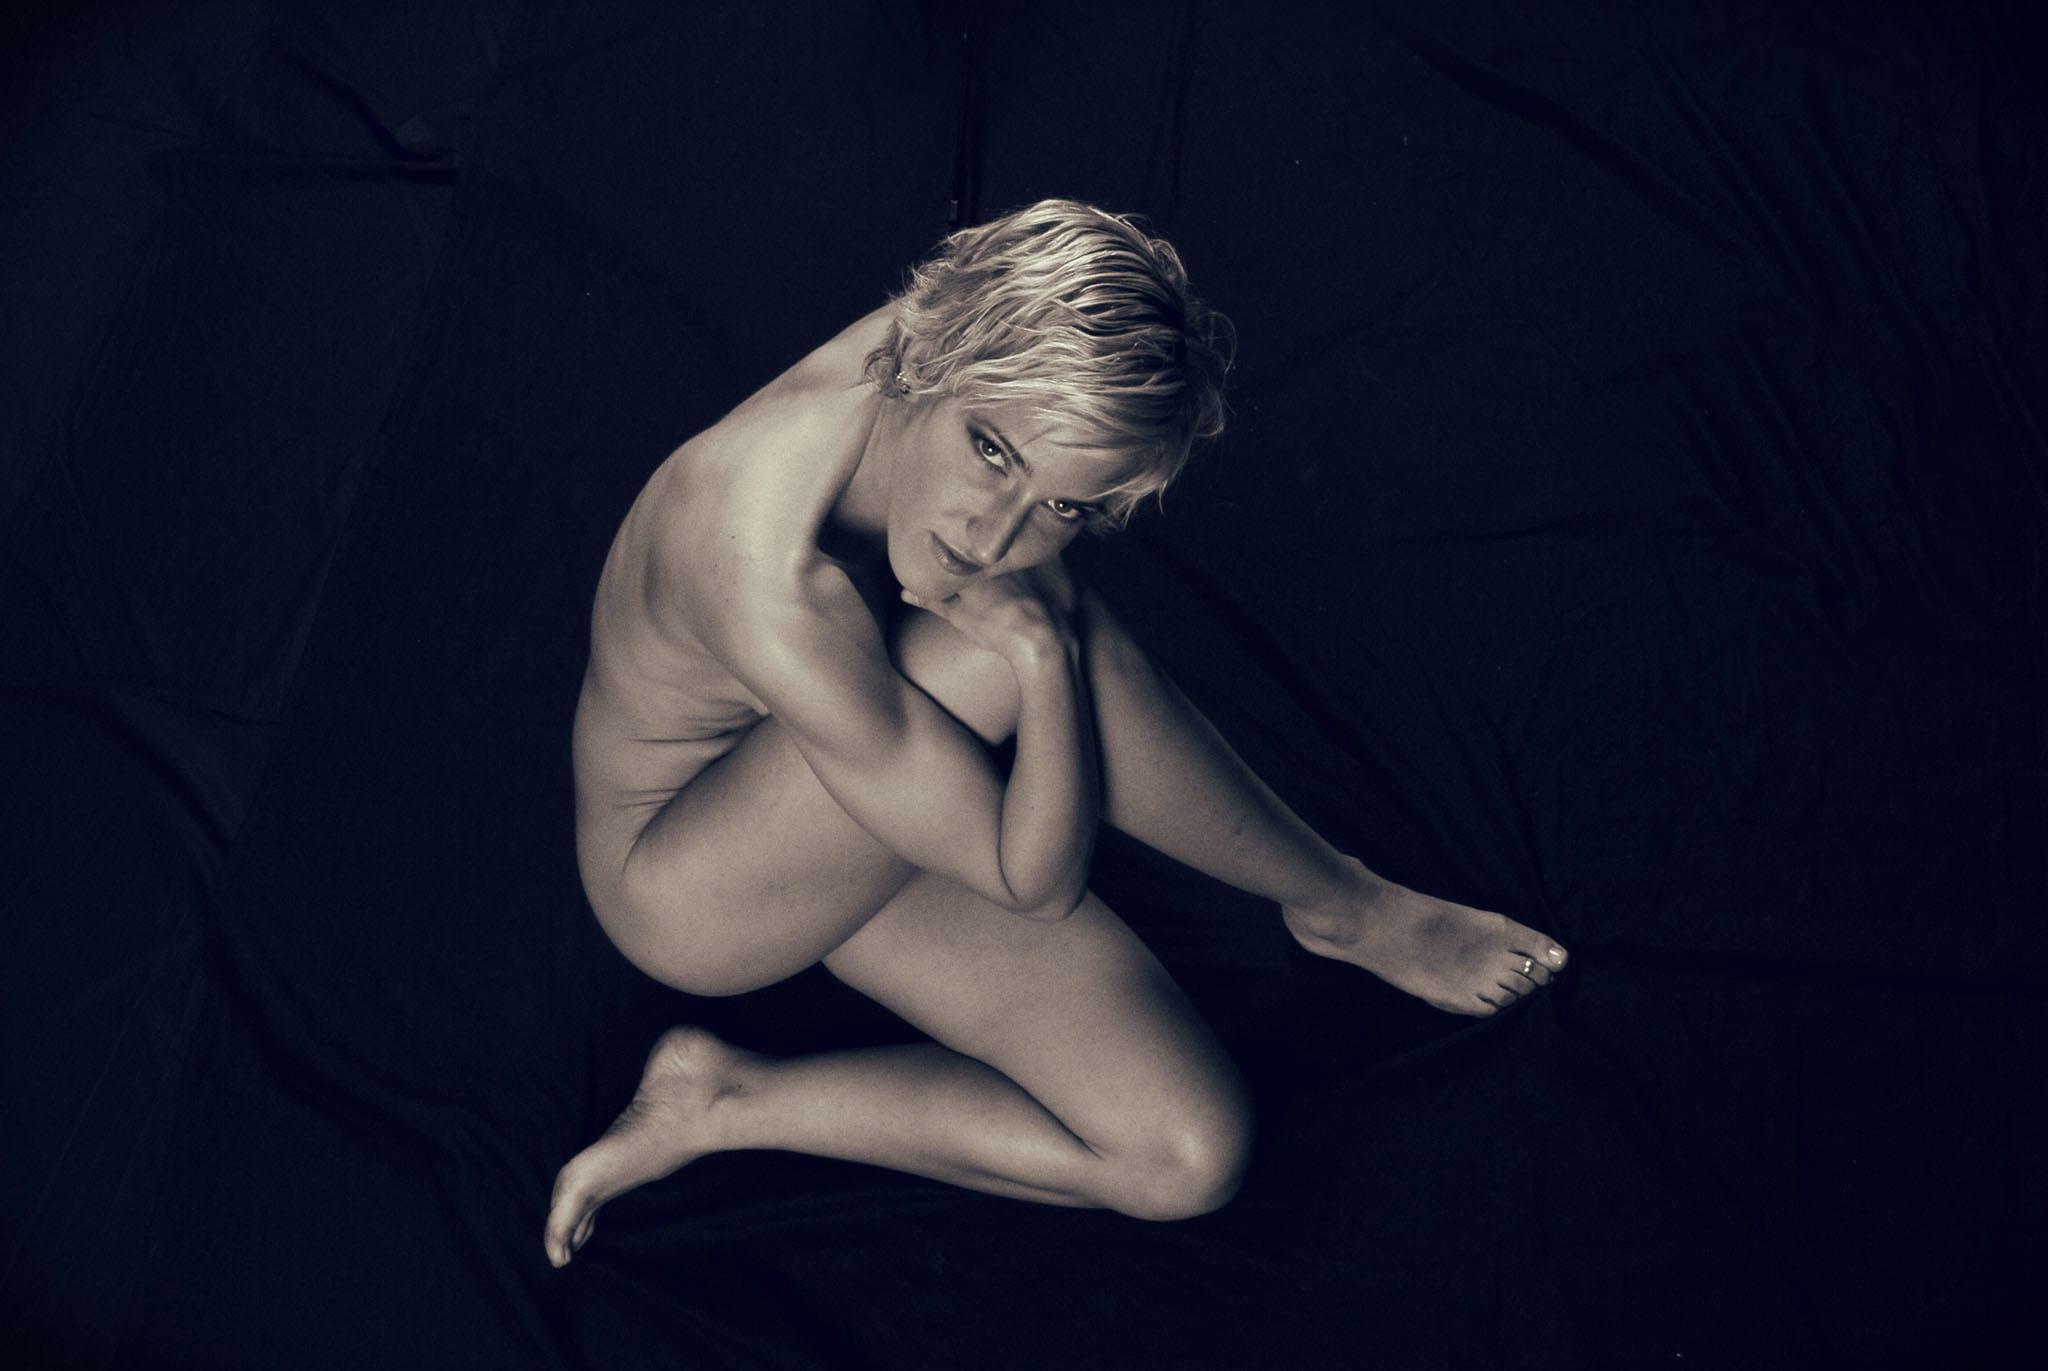 Akt 07- Akt Nude Act Aktfotografie Erotik Erotic